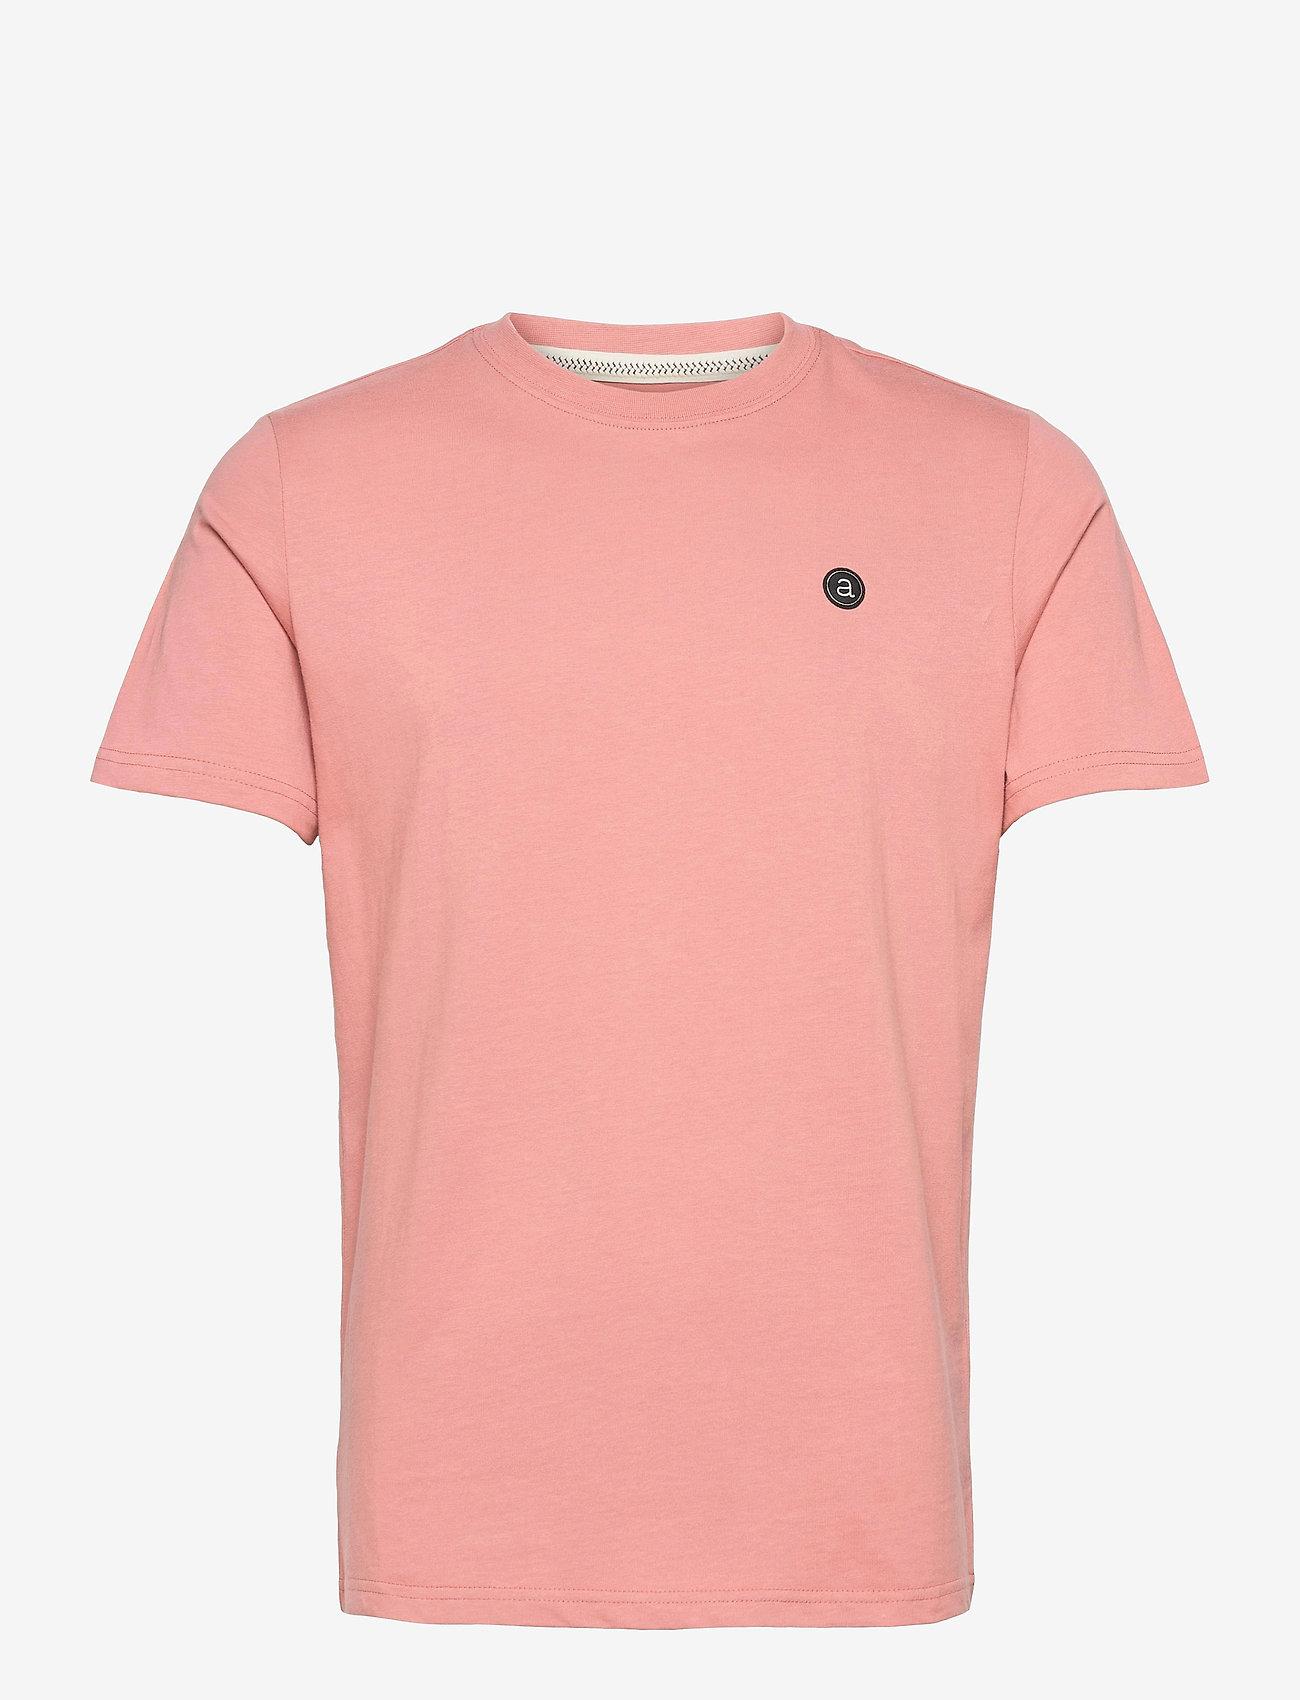 Anerkjendt - AKROD T-SHIRT - t-shirts - old rose - 0